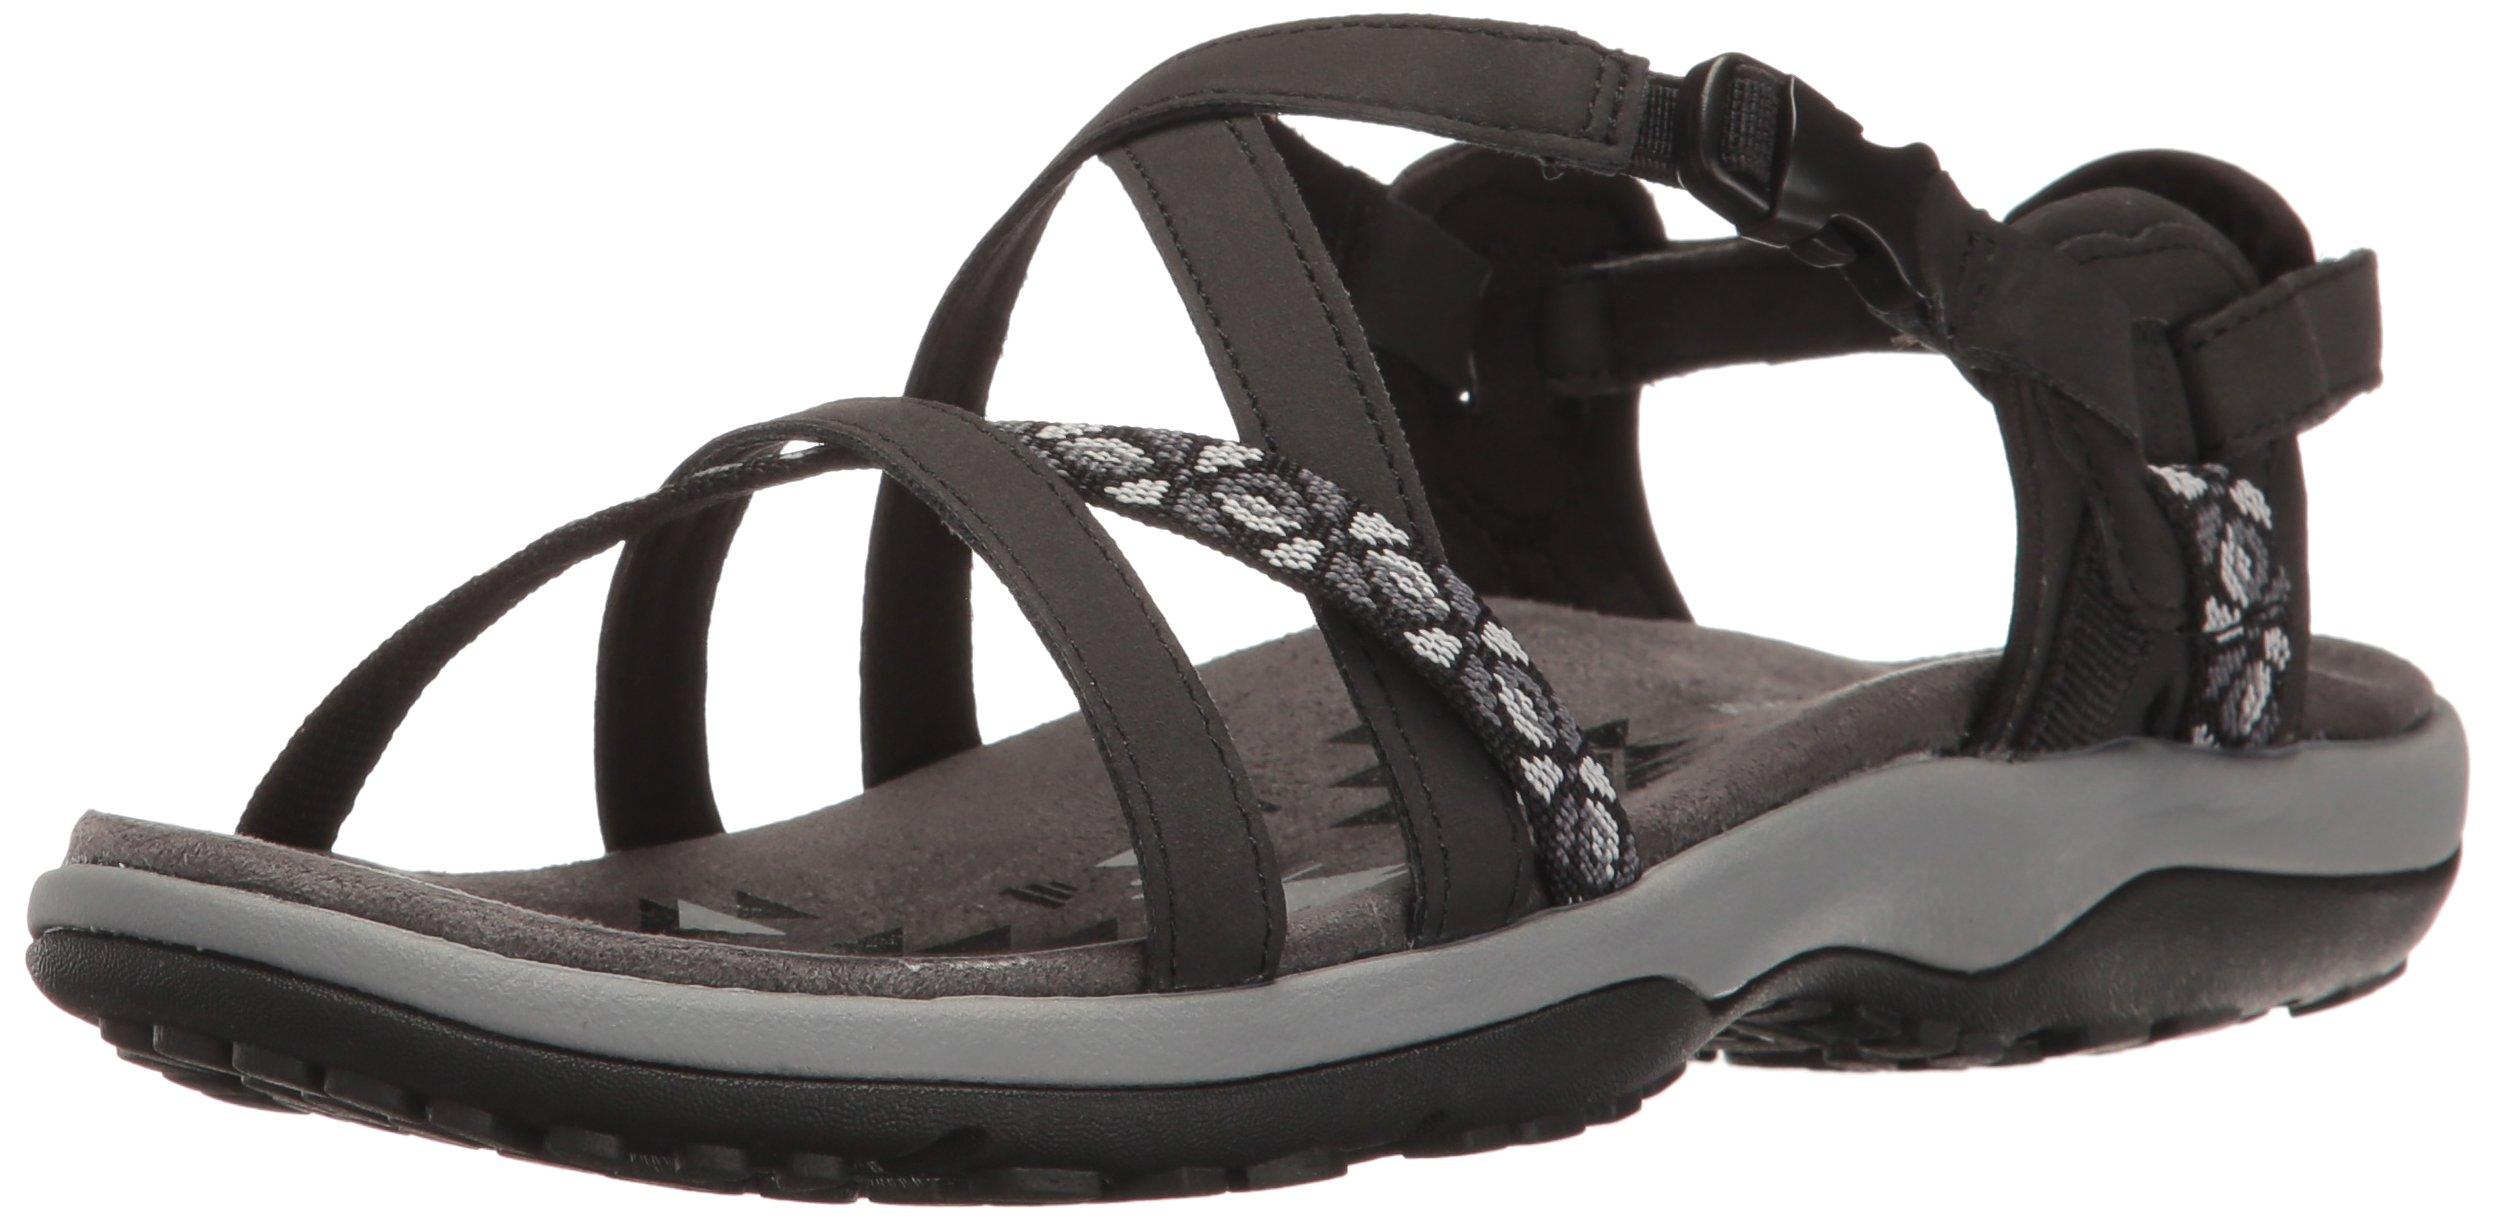 Skechers Women's Regga Slim Keep Close Gladiator Sandal,Black,9 M US